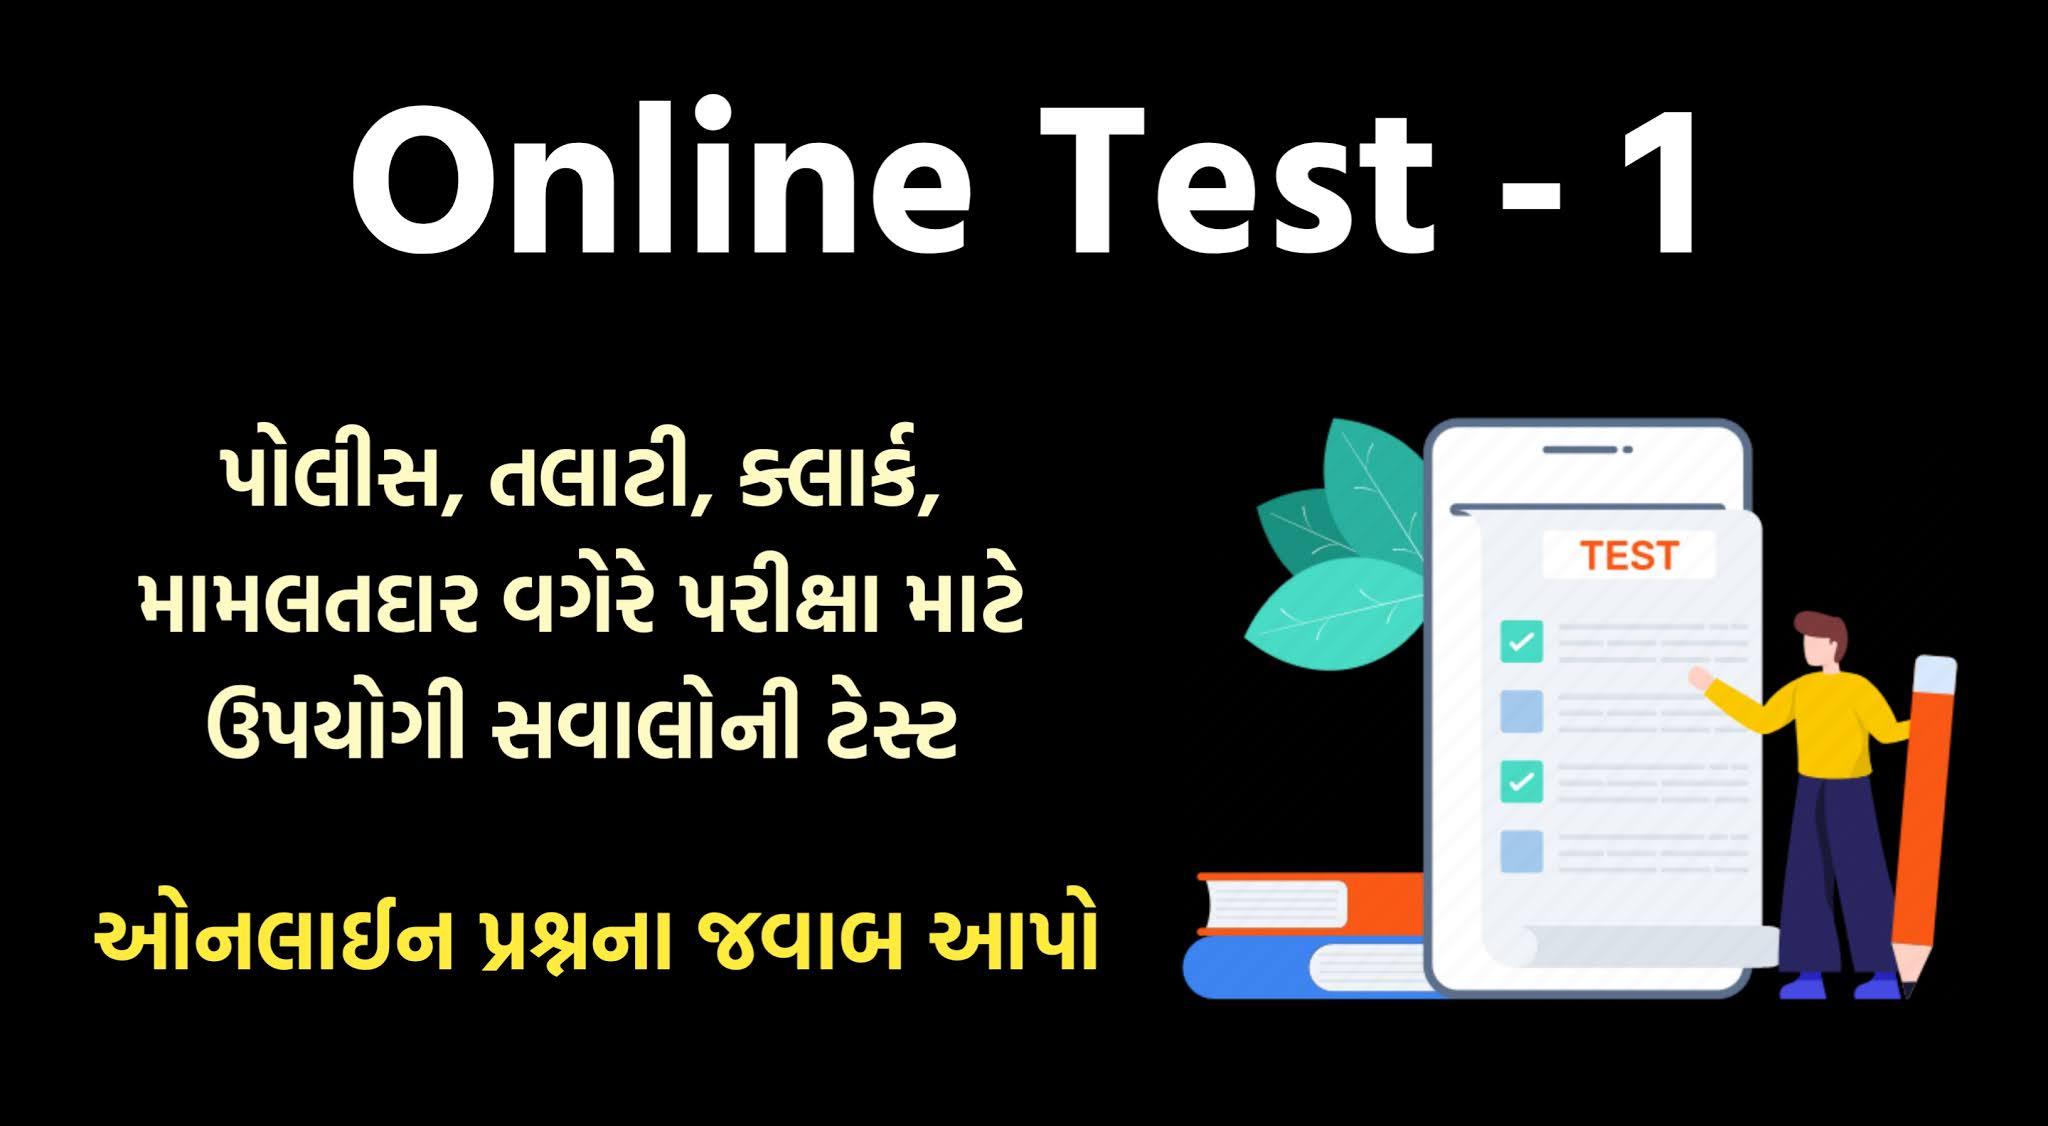 Online GK Quiz - 1 by myojasupdate